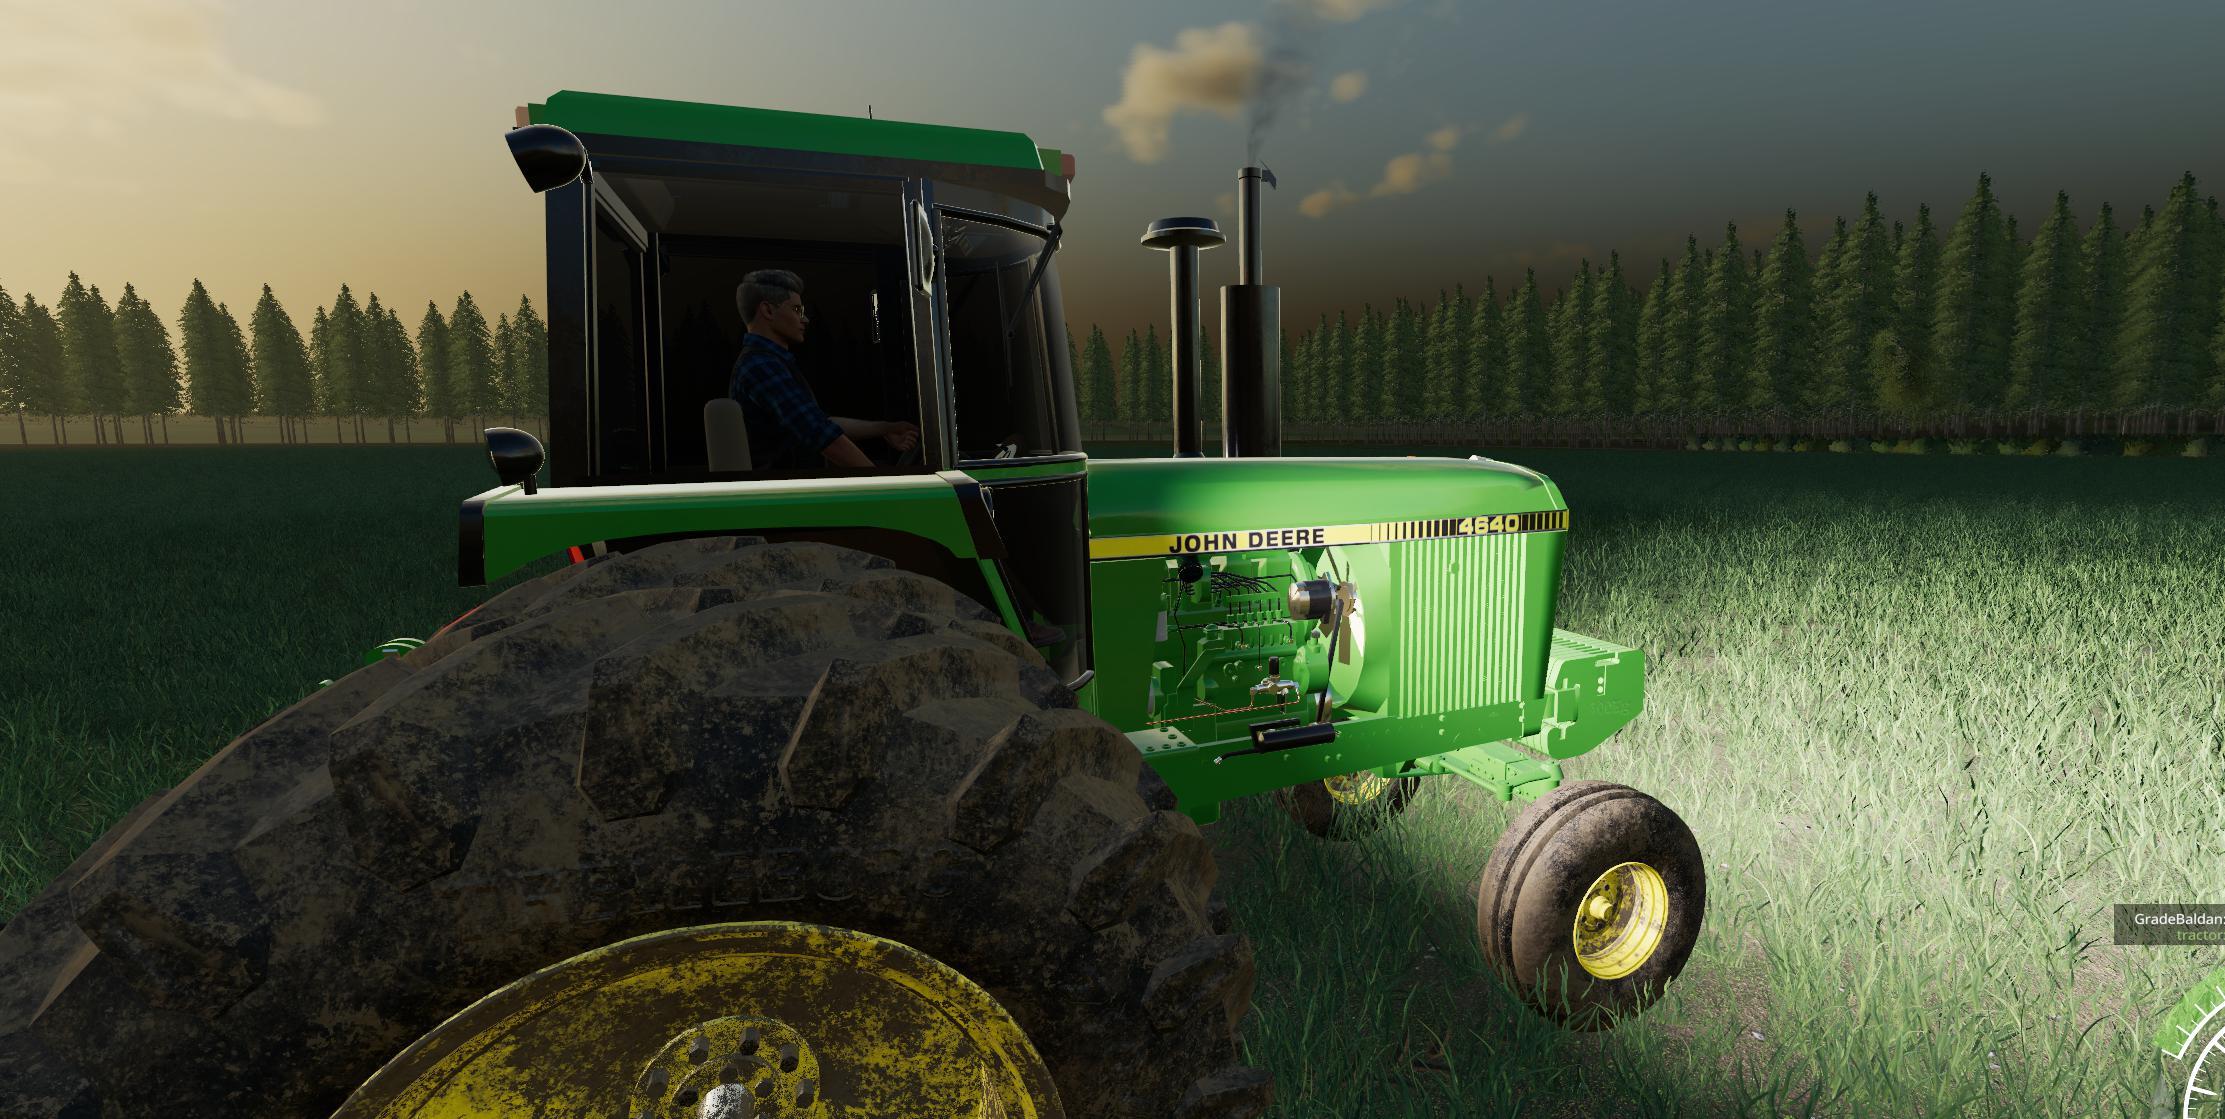 LS19 John Deere 4640 v1 0 0 1 - Farming Simulator 19 mod